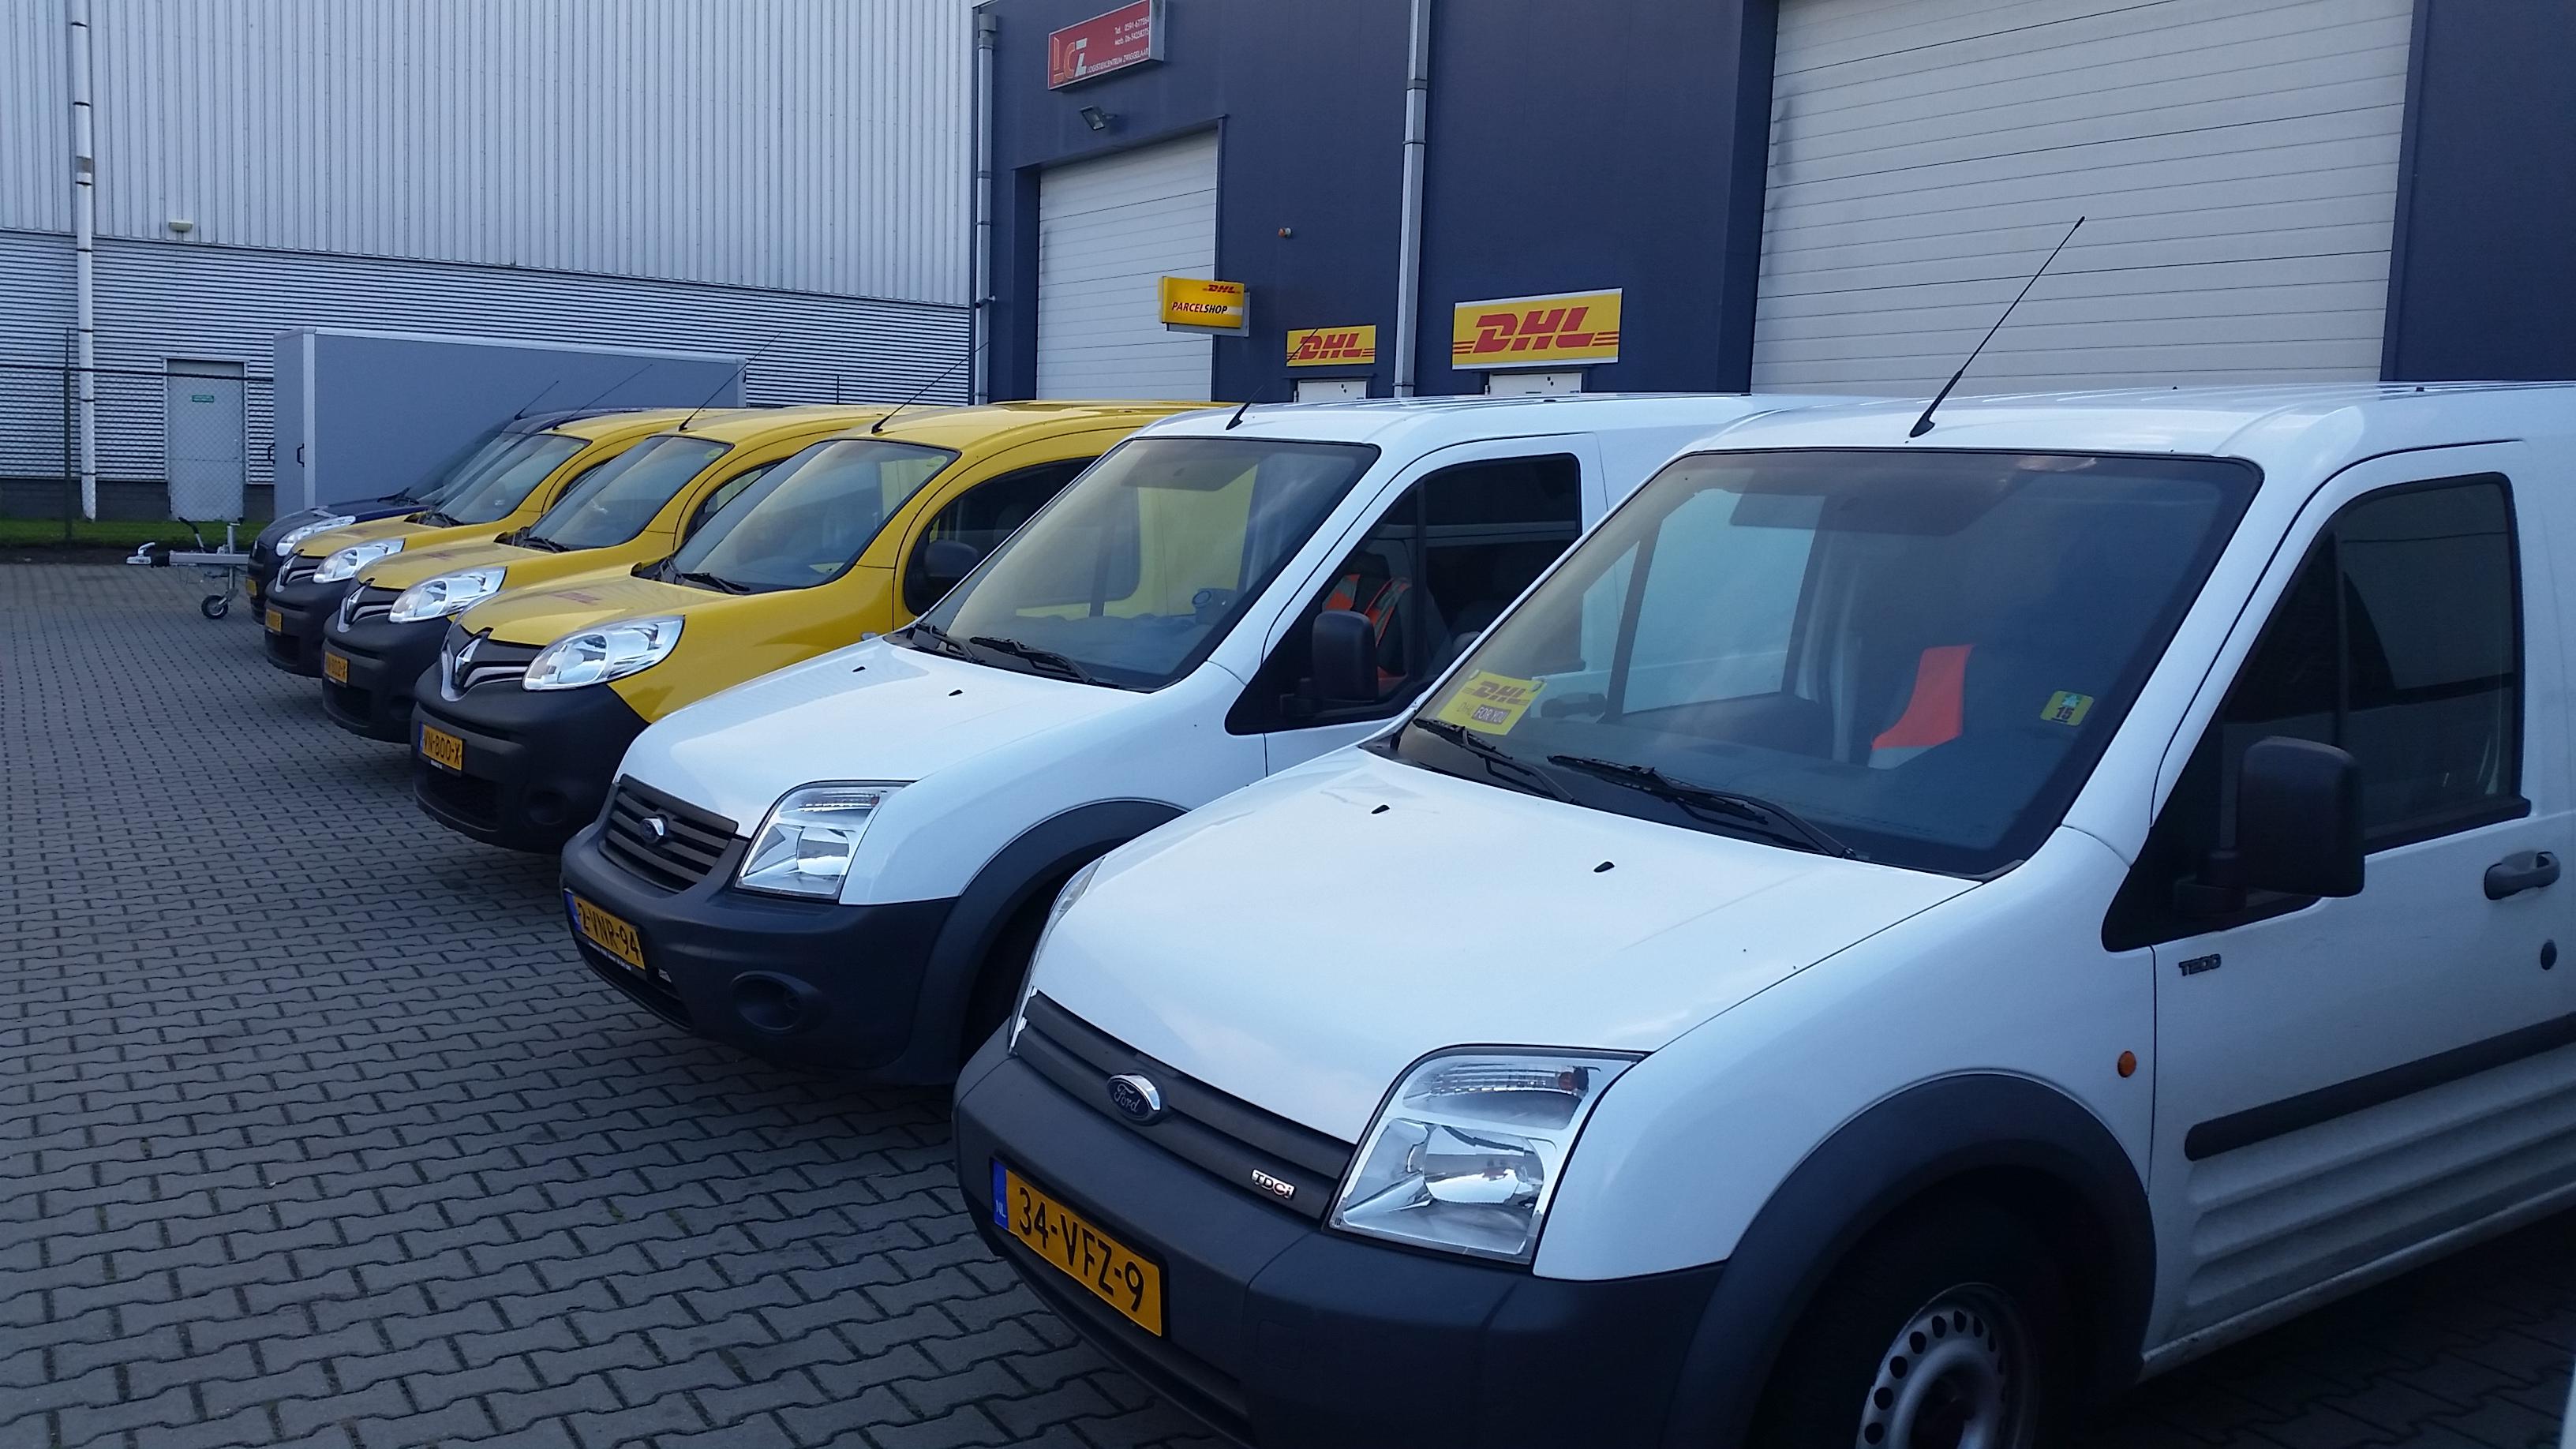 http://logistiekcentrumzwiggelaar.nl/wp-content/uploads/2016/10/koeriersauto-logistiek-centrum-zwiggelaar.jpg